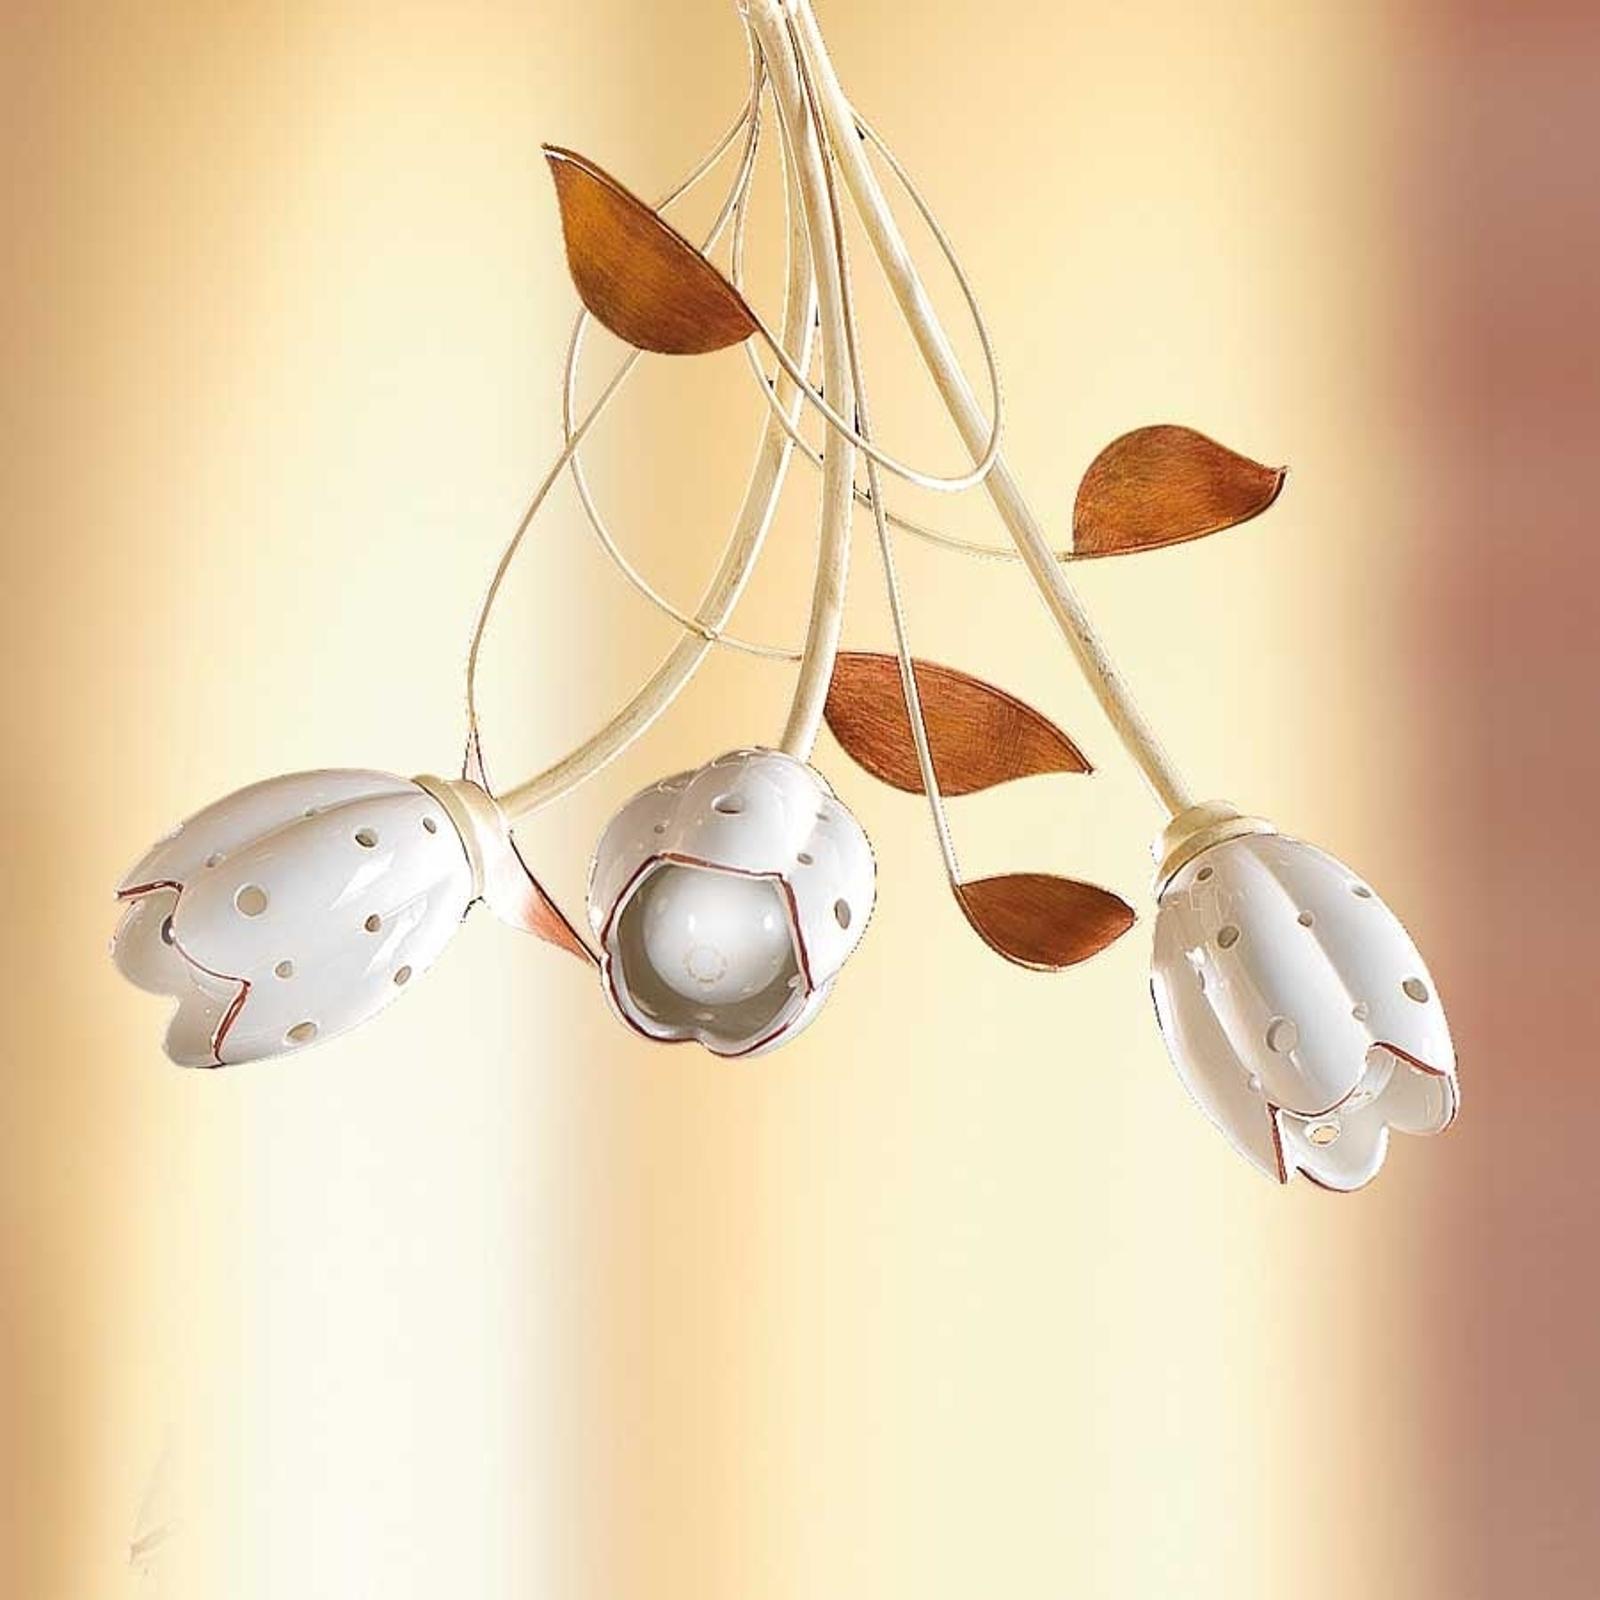 Kvetinová závesná lampa TULIPANO 3-pl._2013080_1